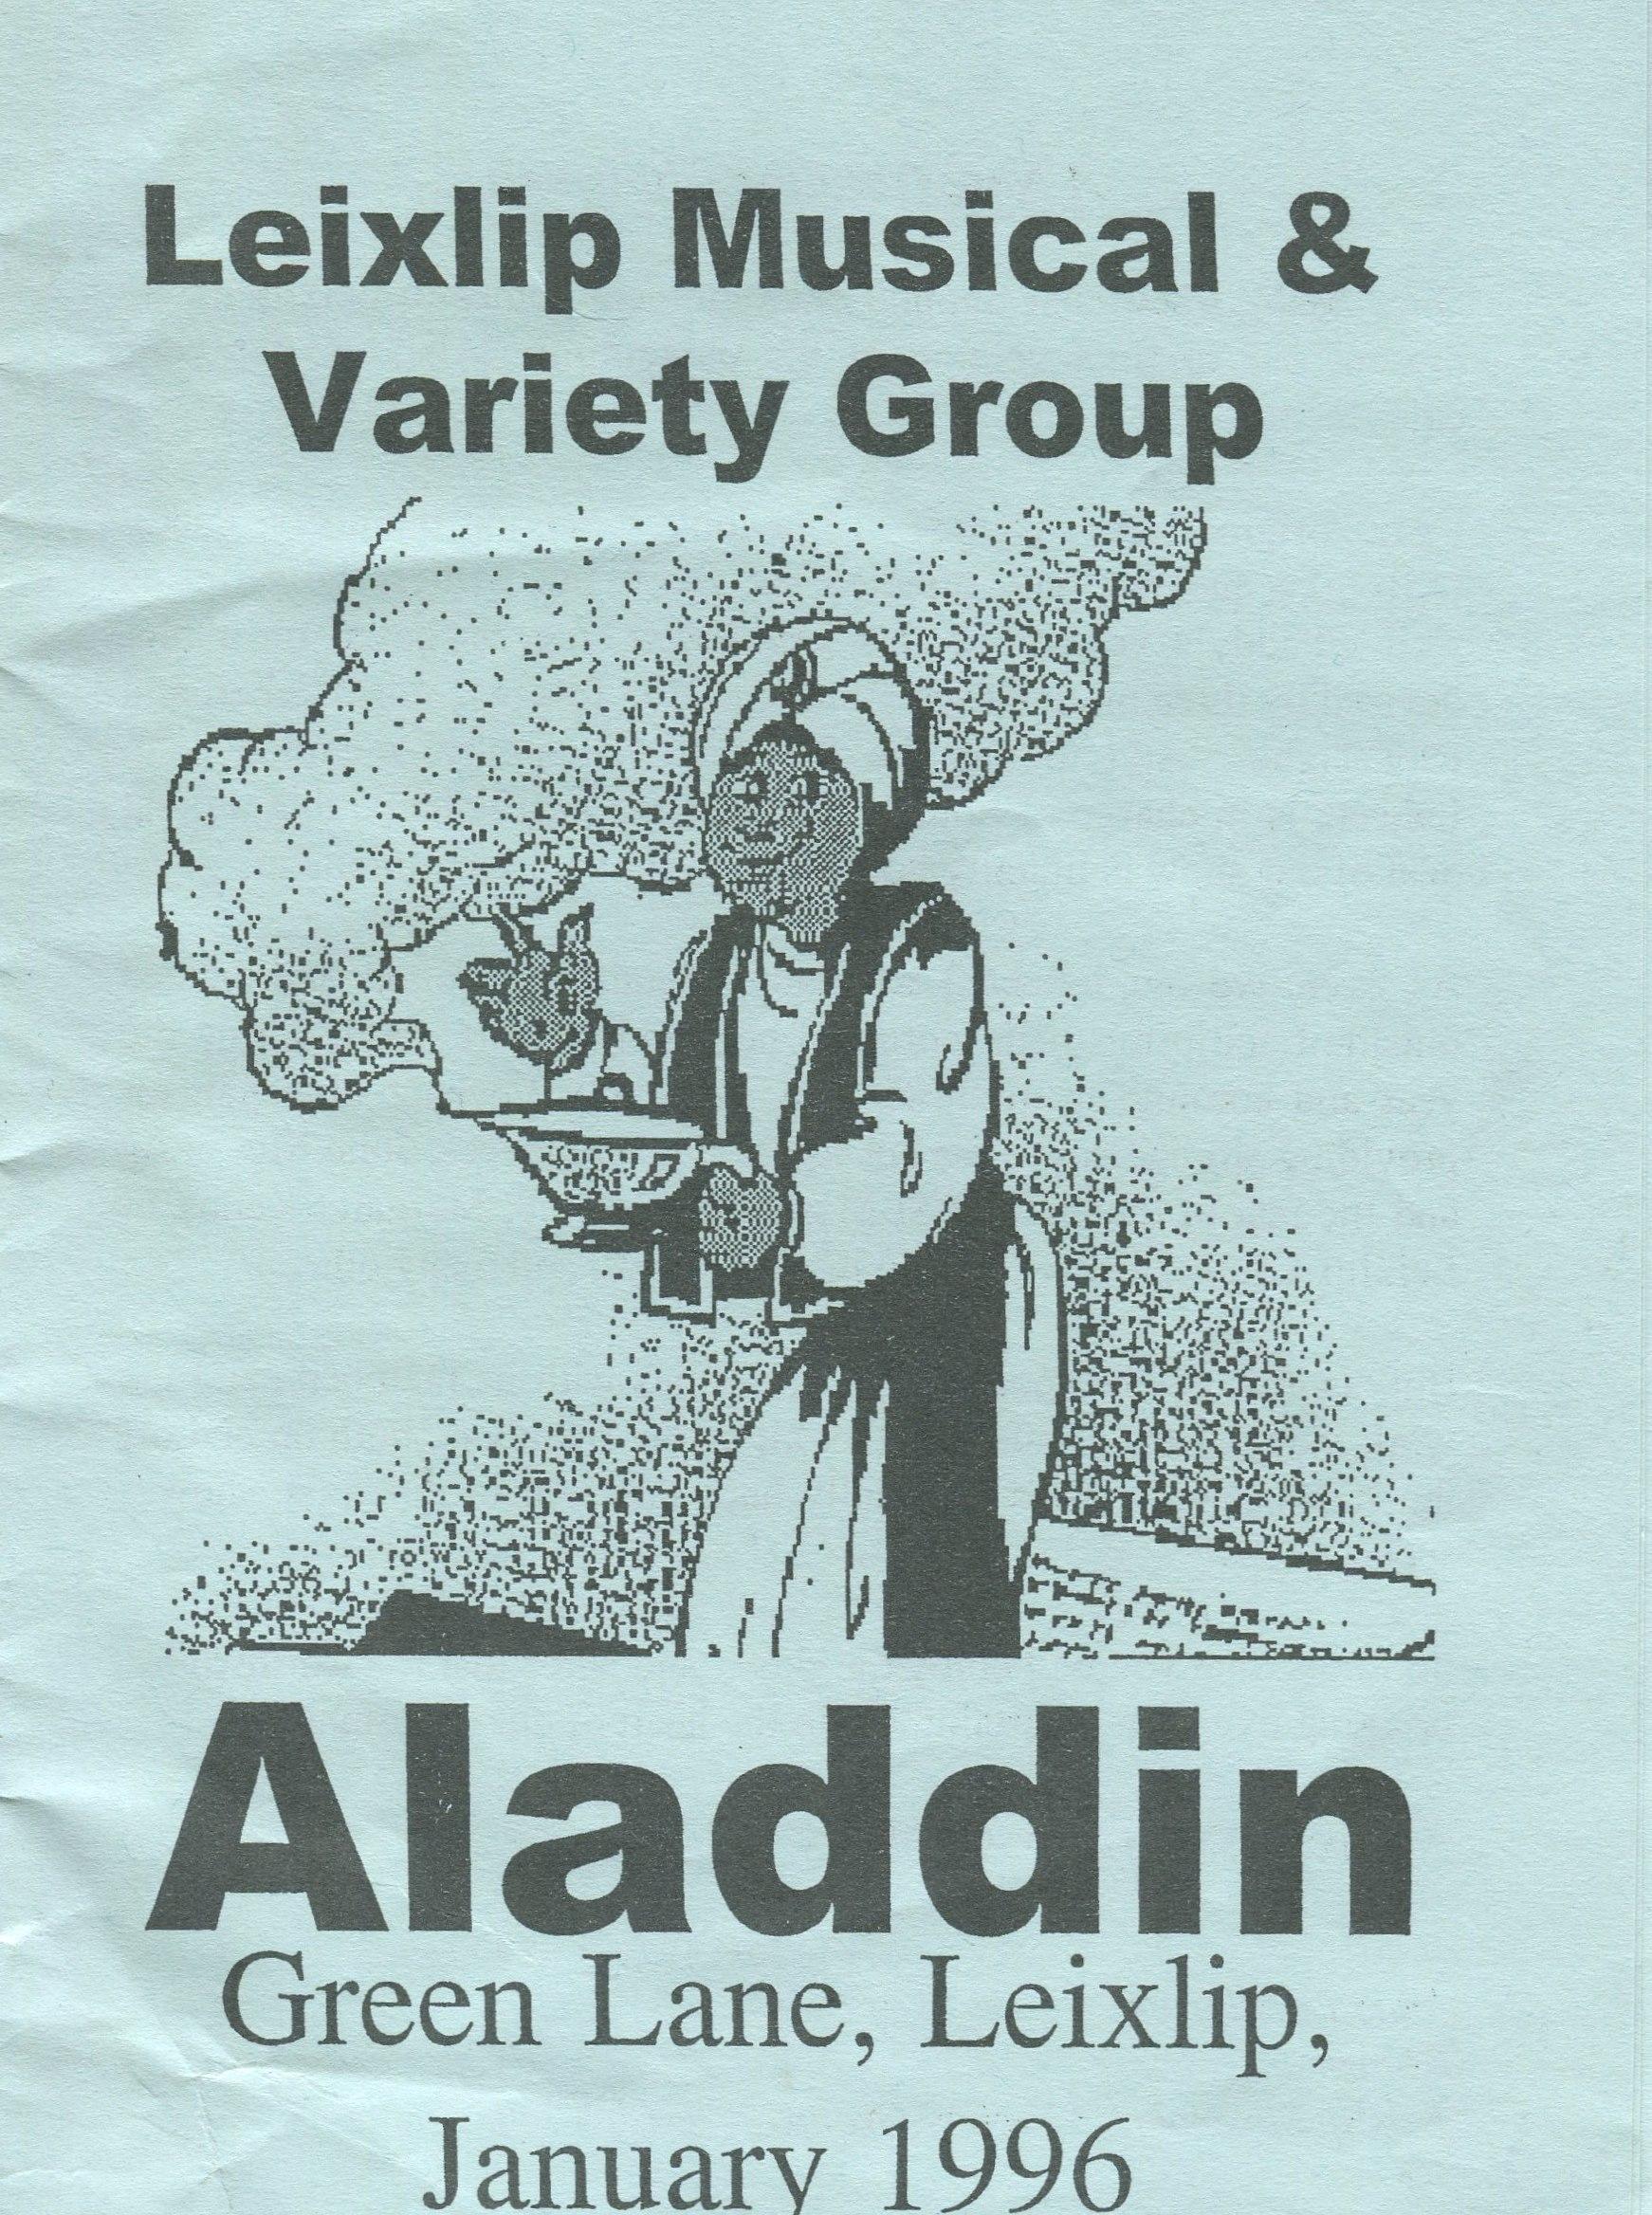 Aladdin, 1996 (www.lmvg.ie)